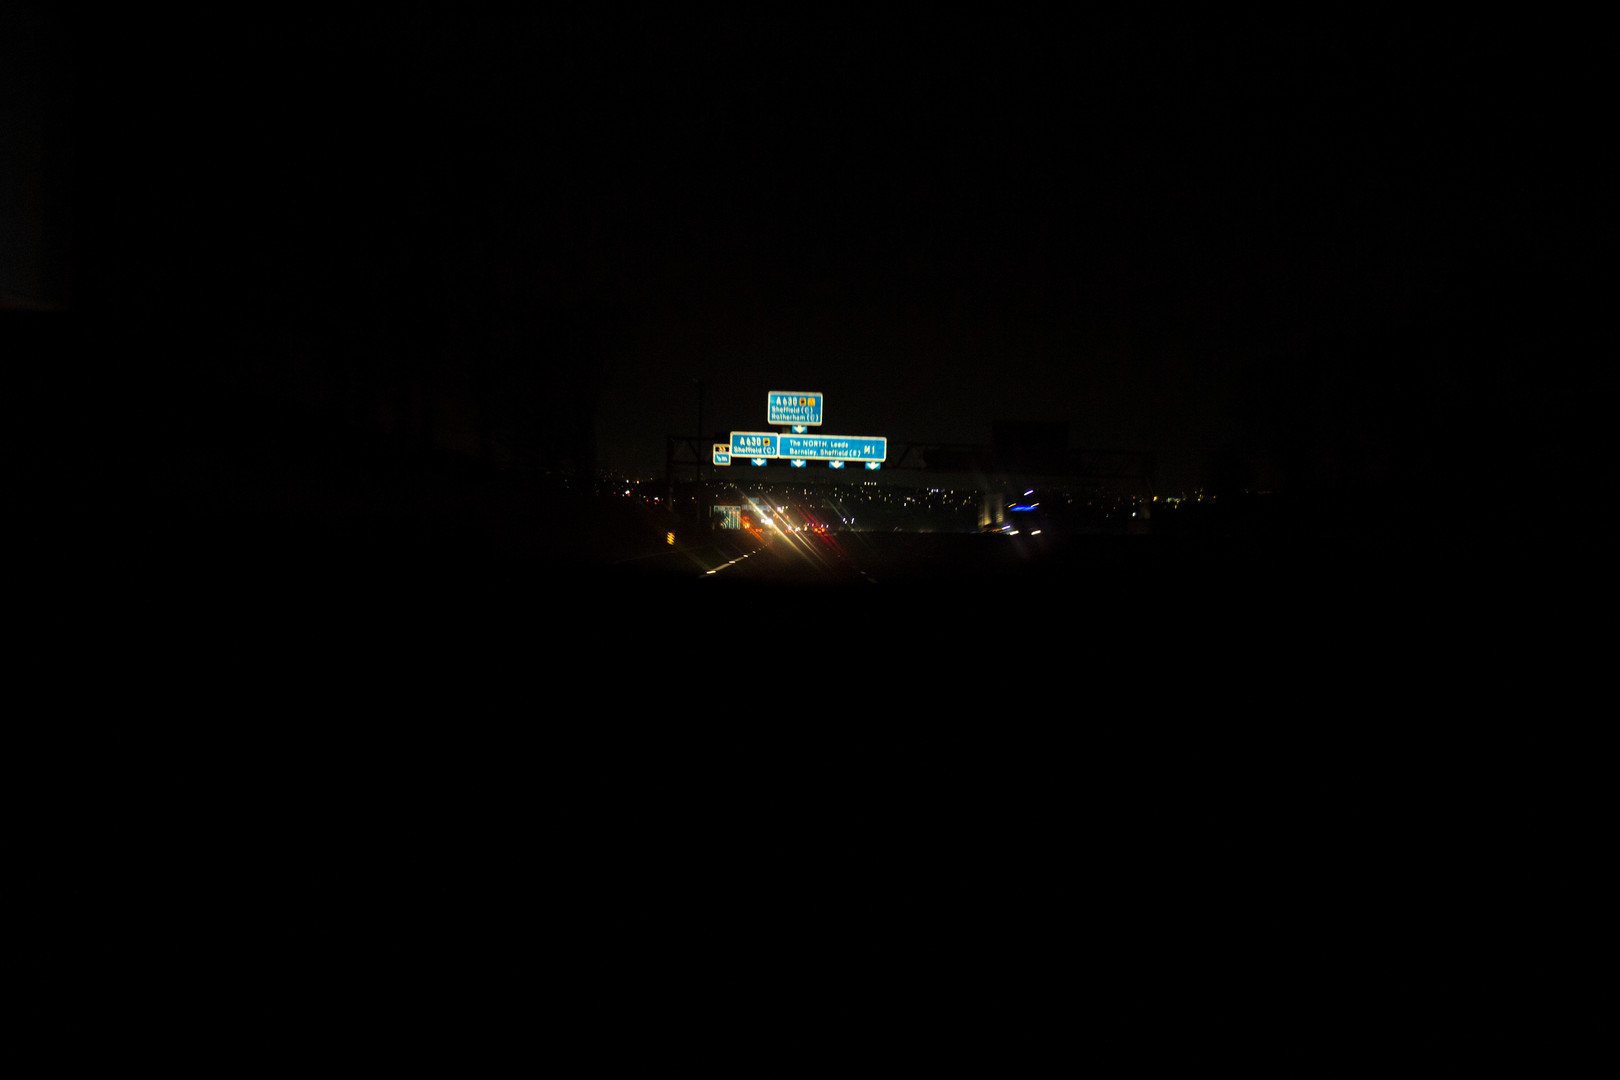 road sign blurry 5.JPG